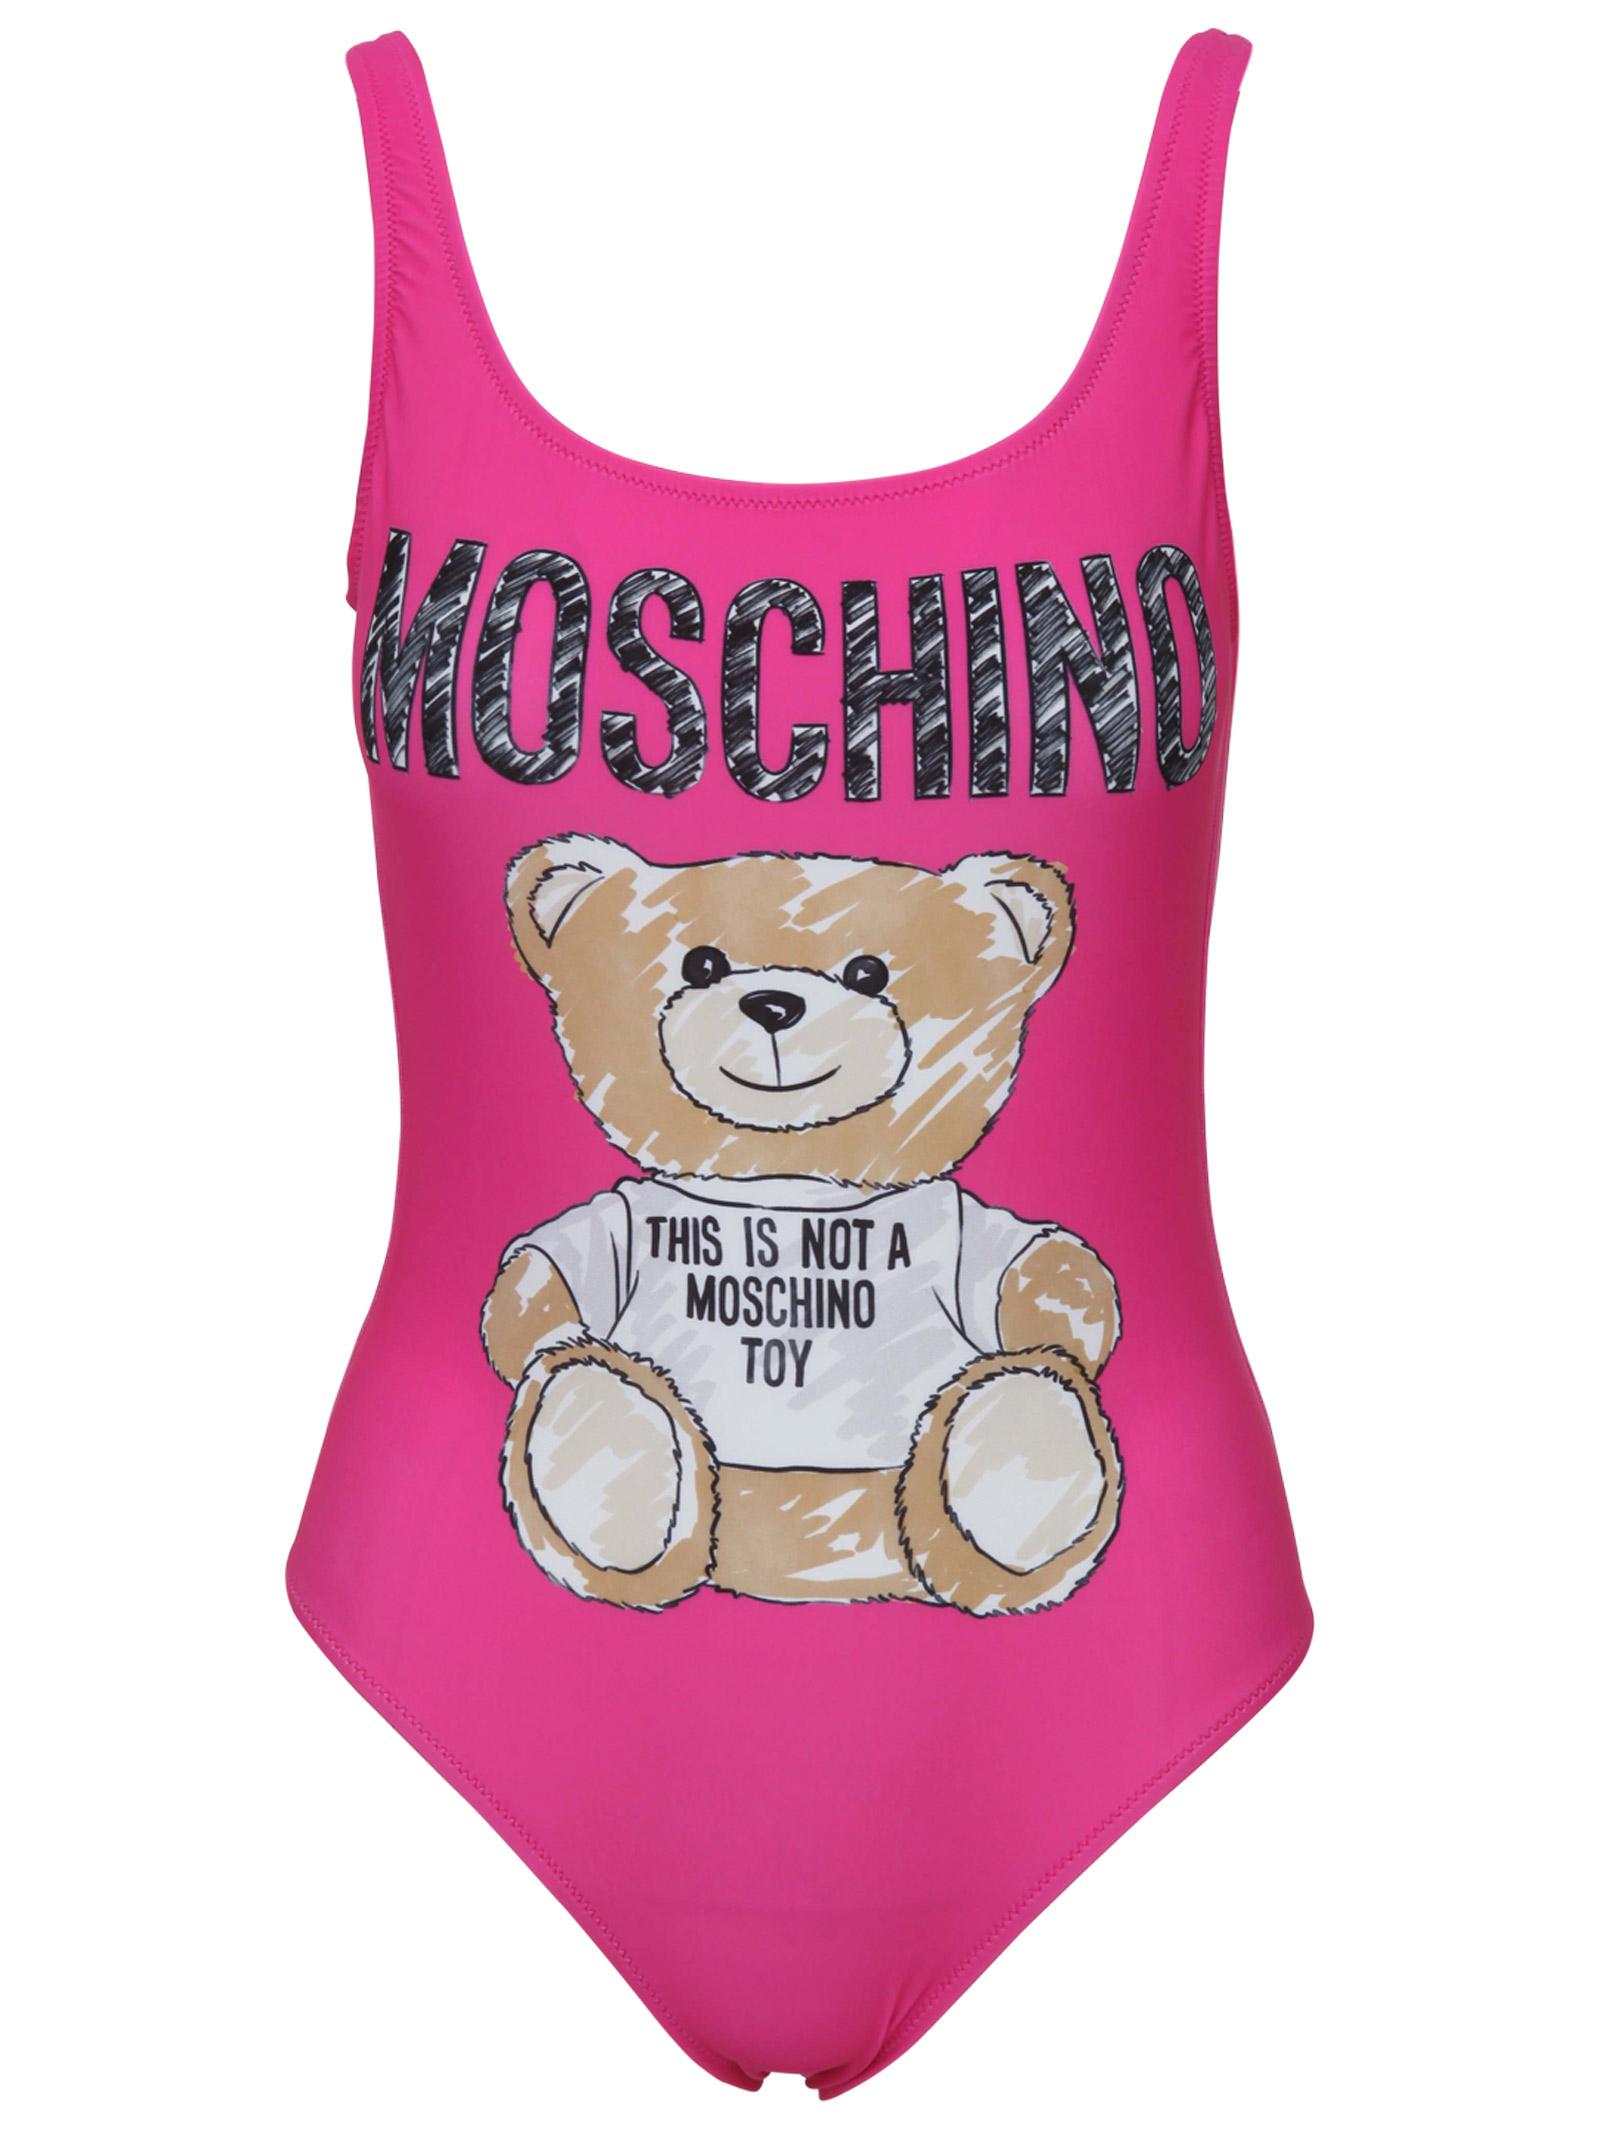 ca18ee3167731 Swimsuit Moschino - Moschino - Michele Franzese Moda